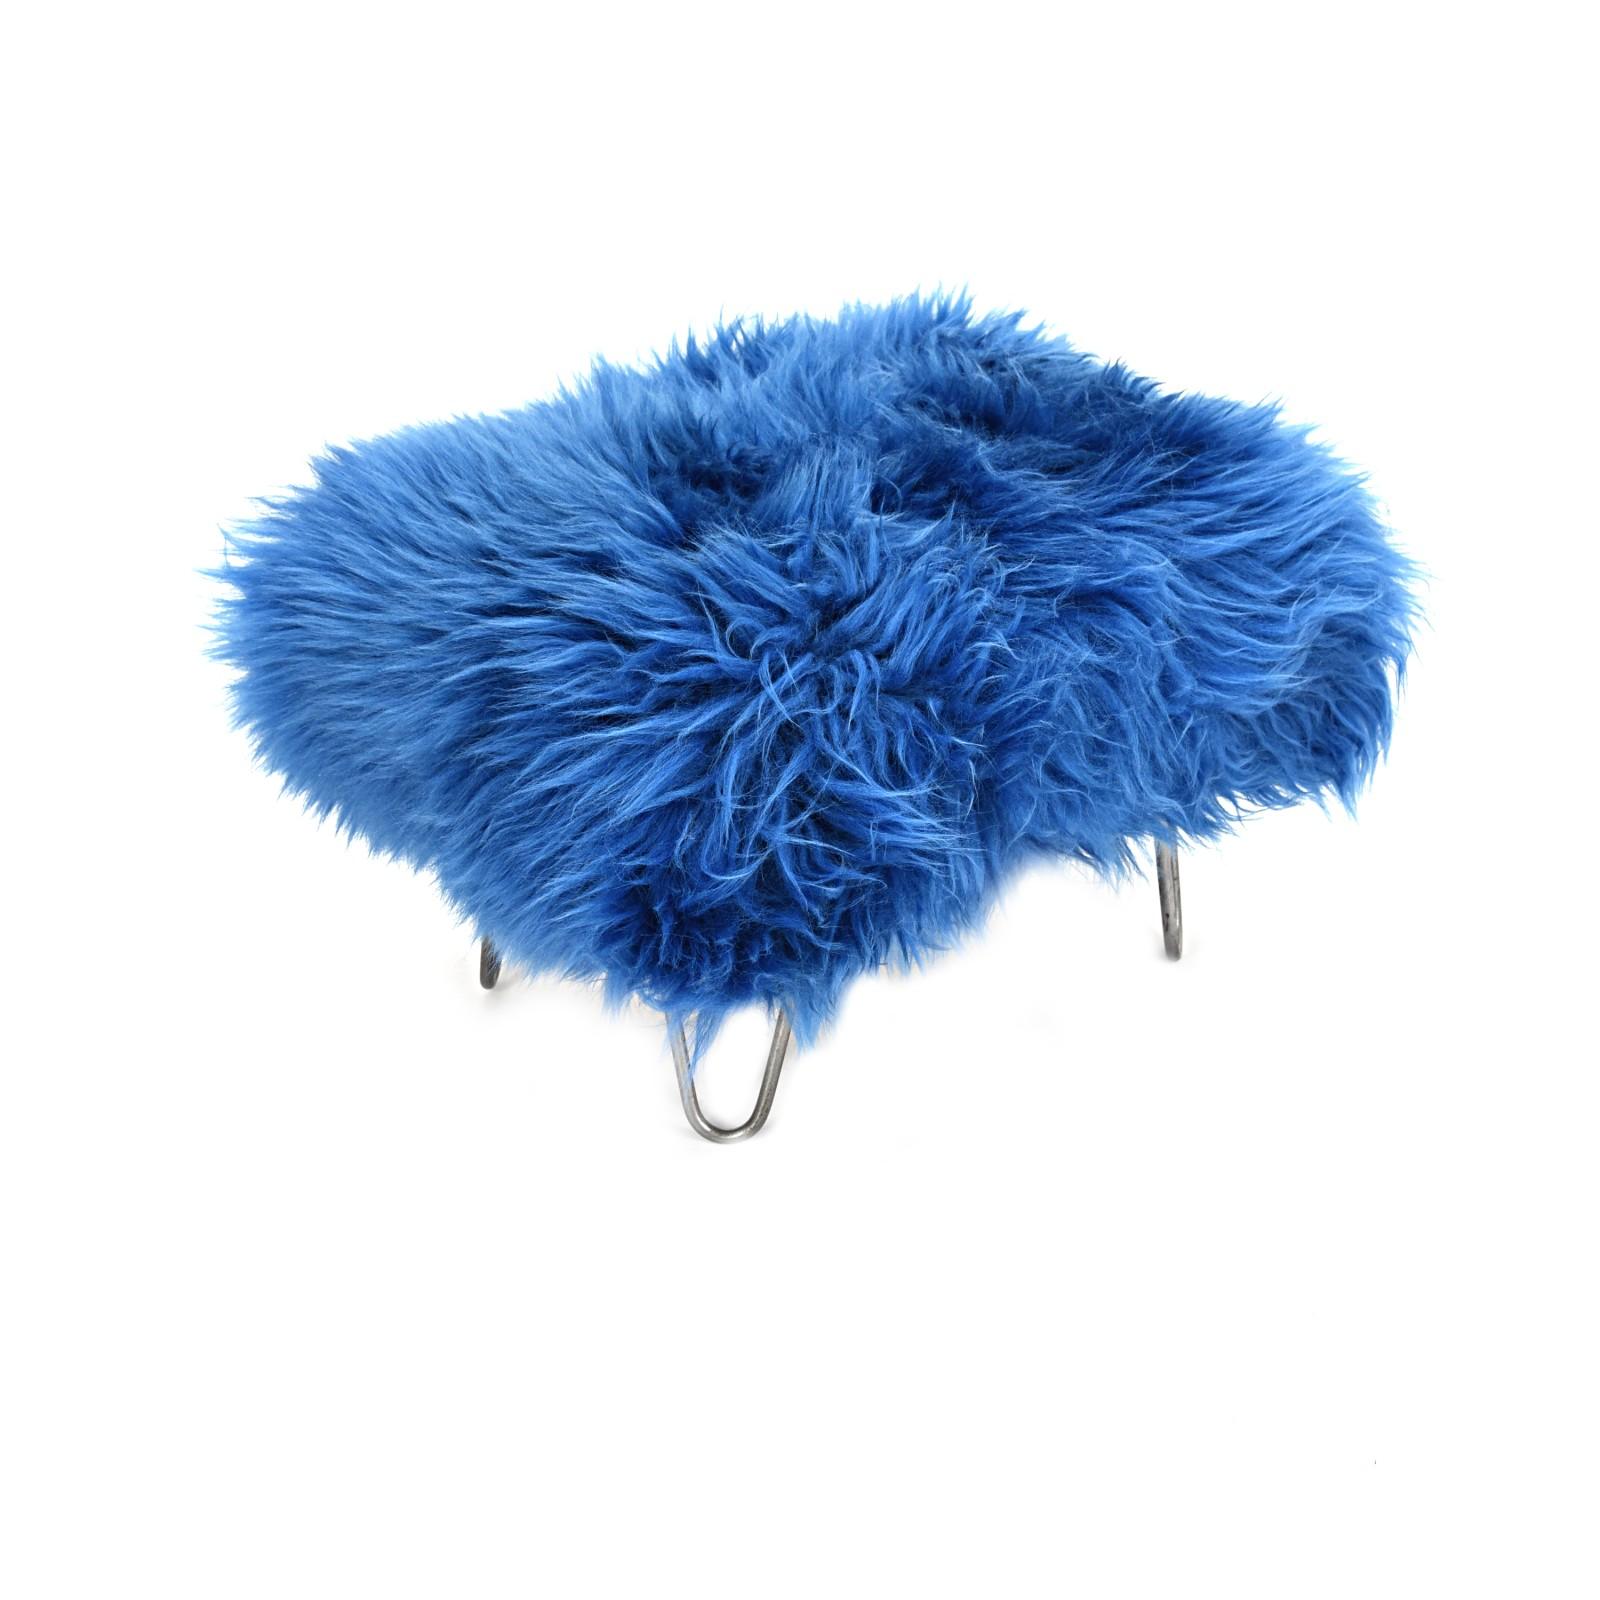 Sara - Sheepskin Footstool Cornflower Blue